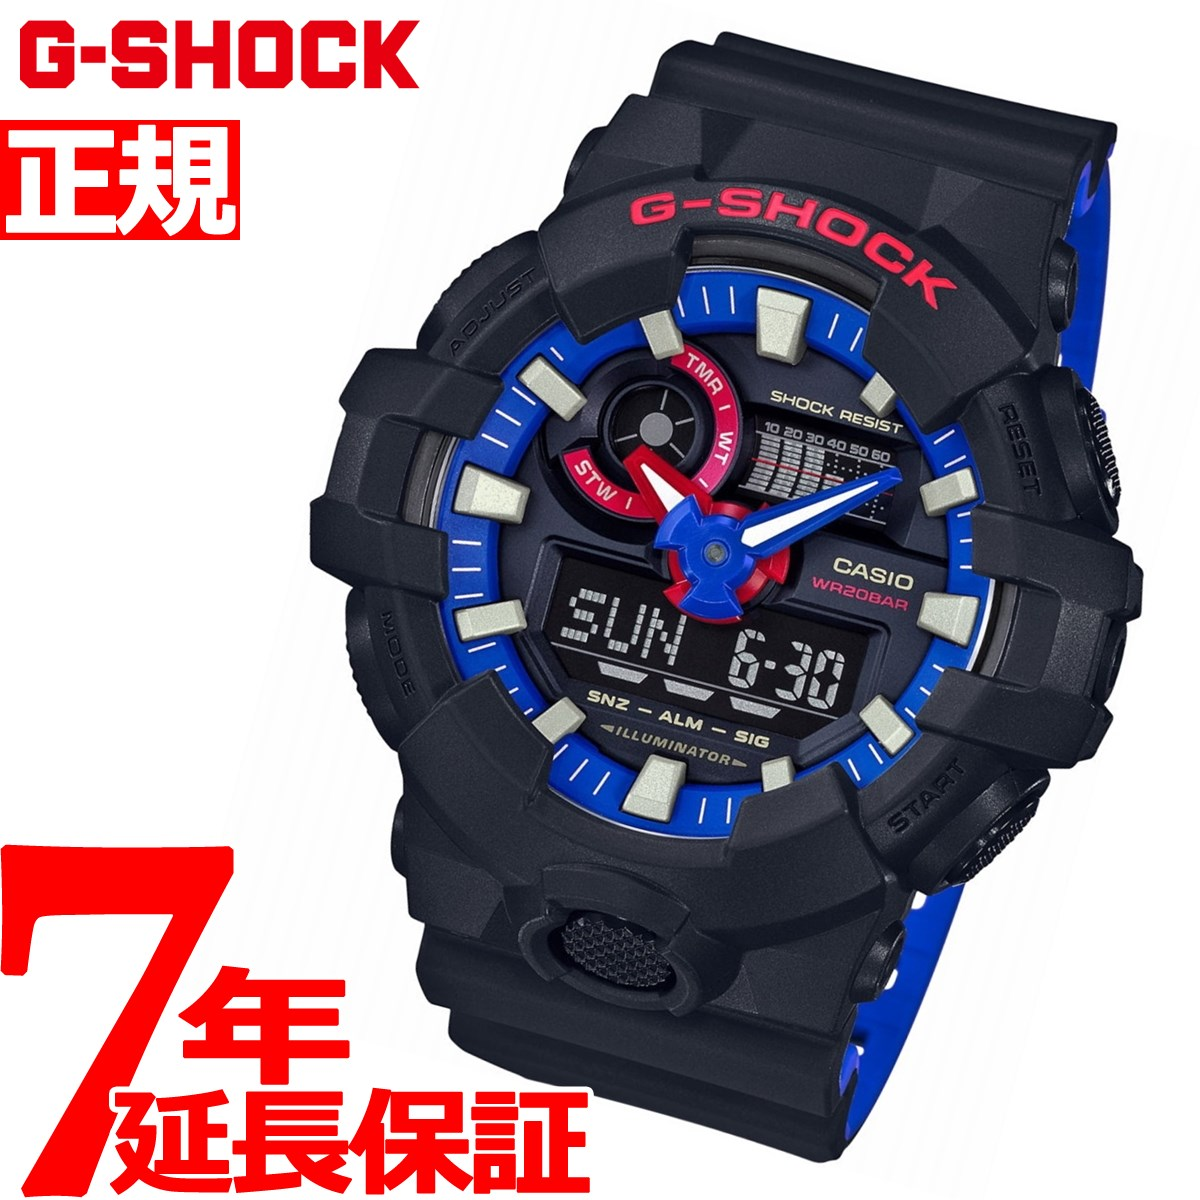 G-SHOCK アナデジ メンズ 腕時計 トリコロール GA-700LT-1AJF【2018 新作】